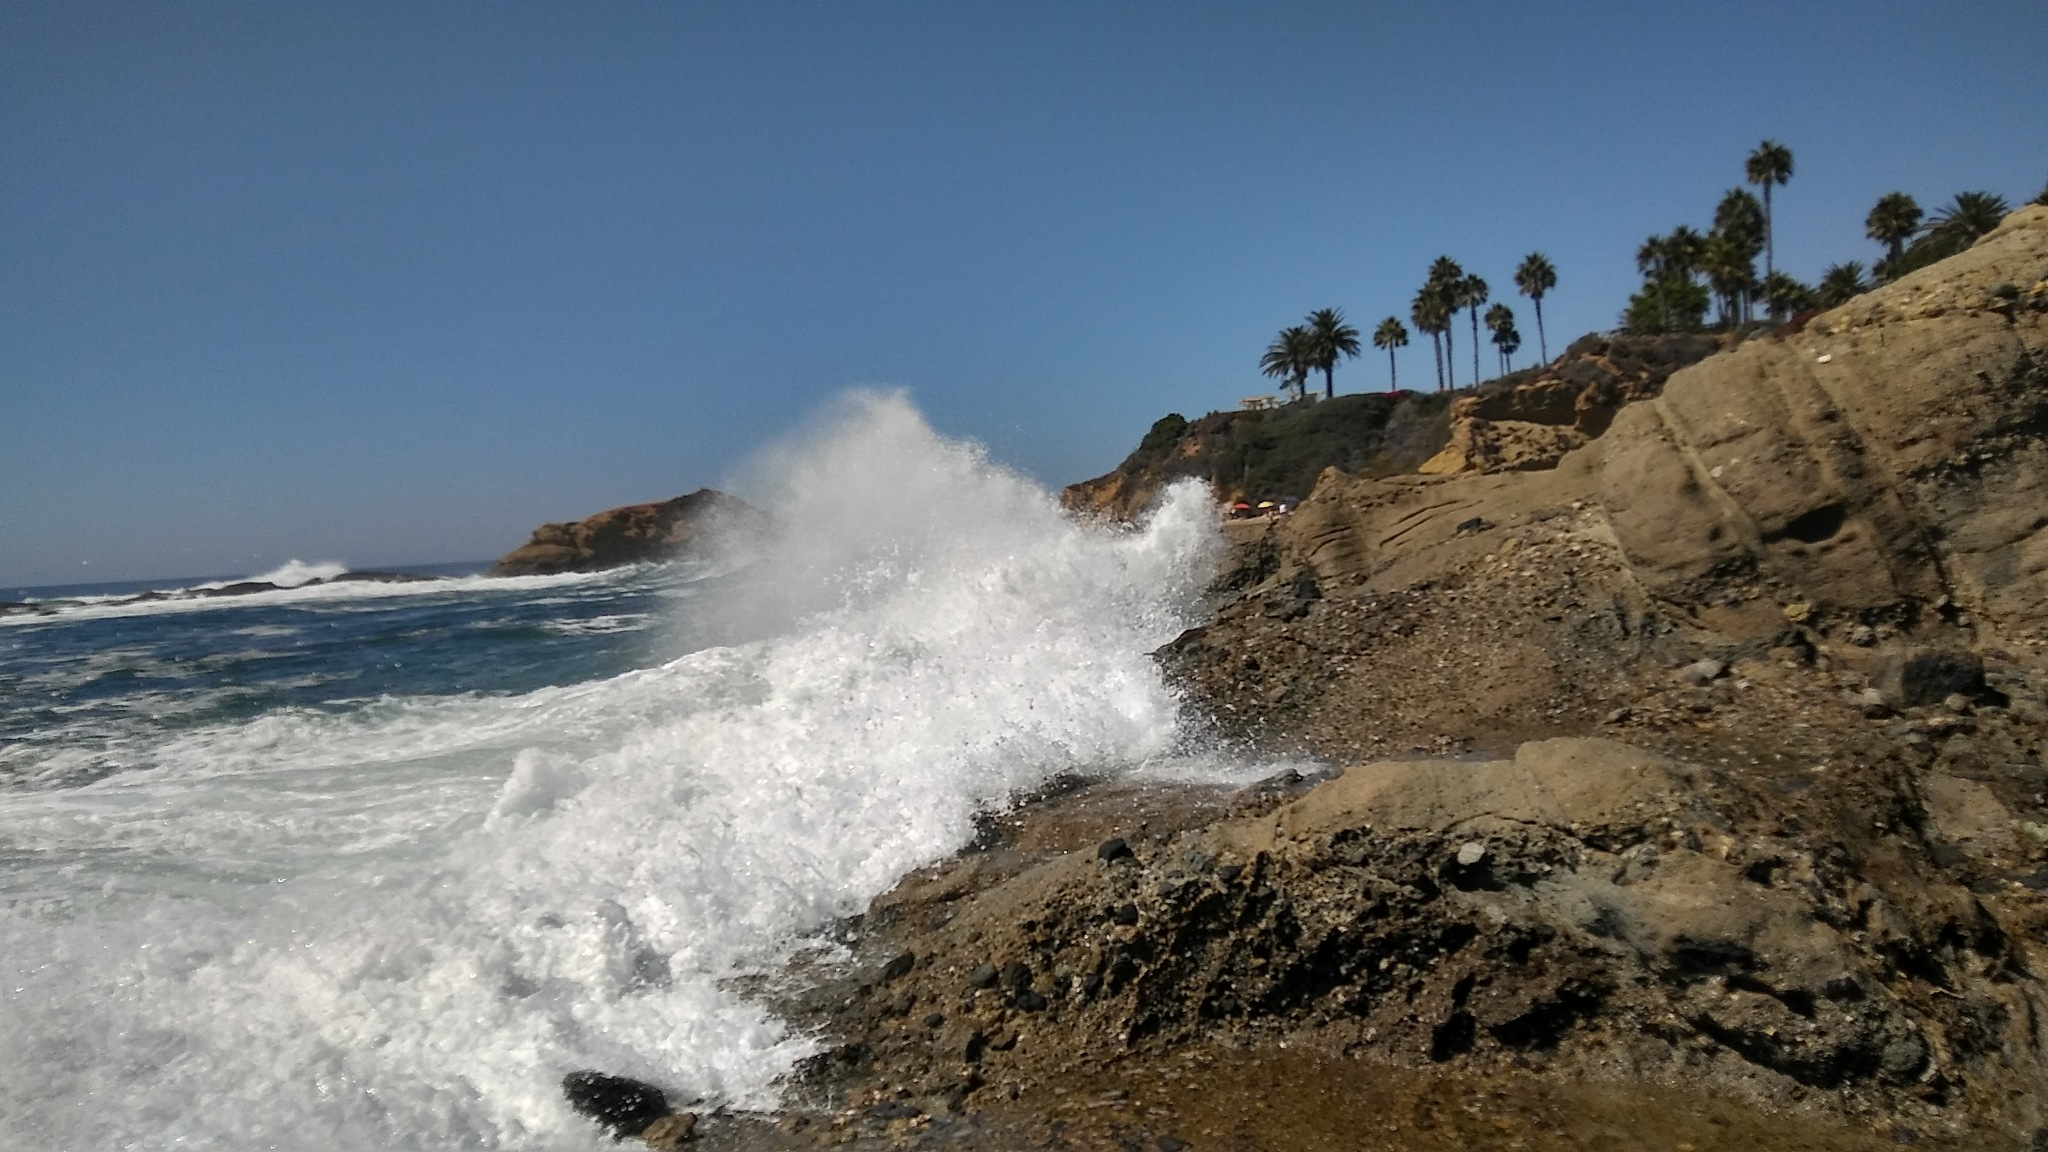 Montage Way, Laguna Beach by Laurie Puglia